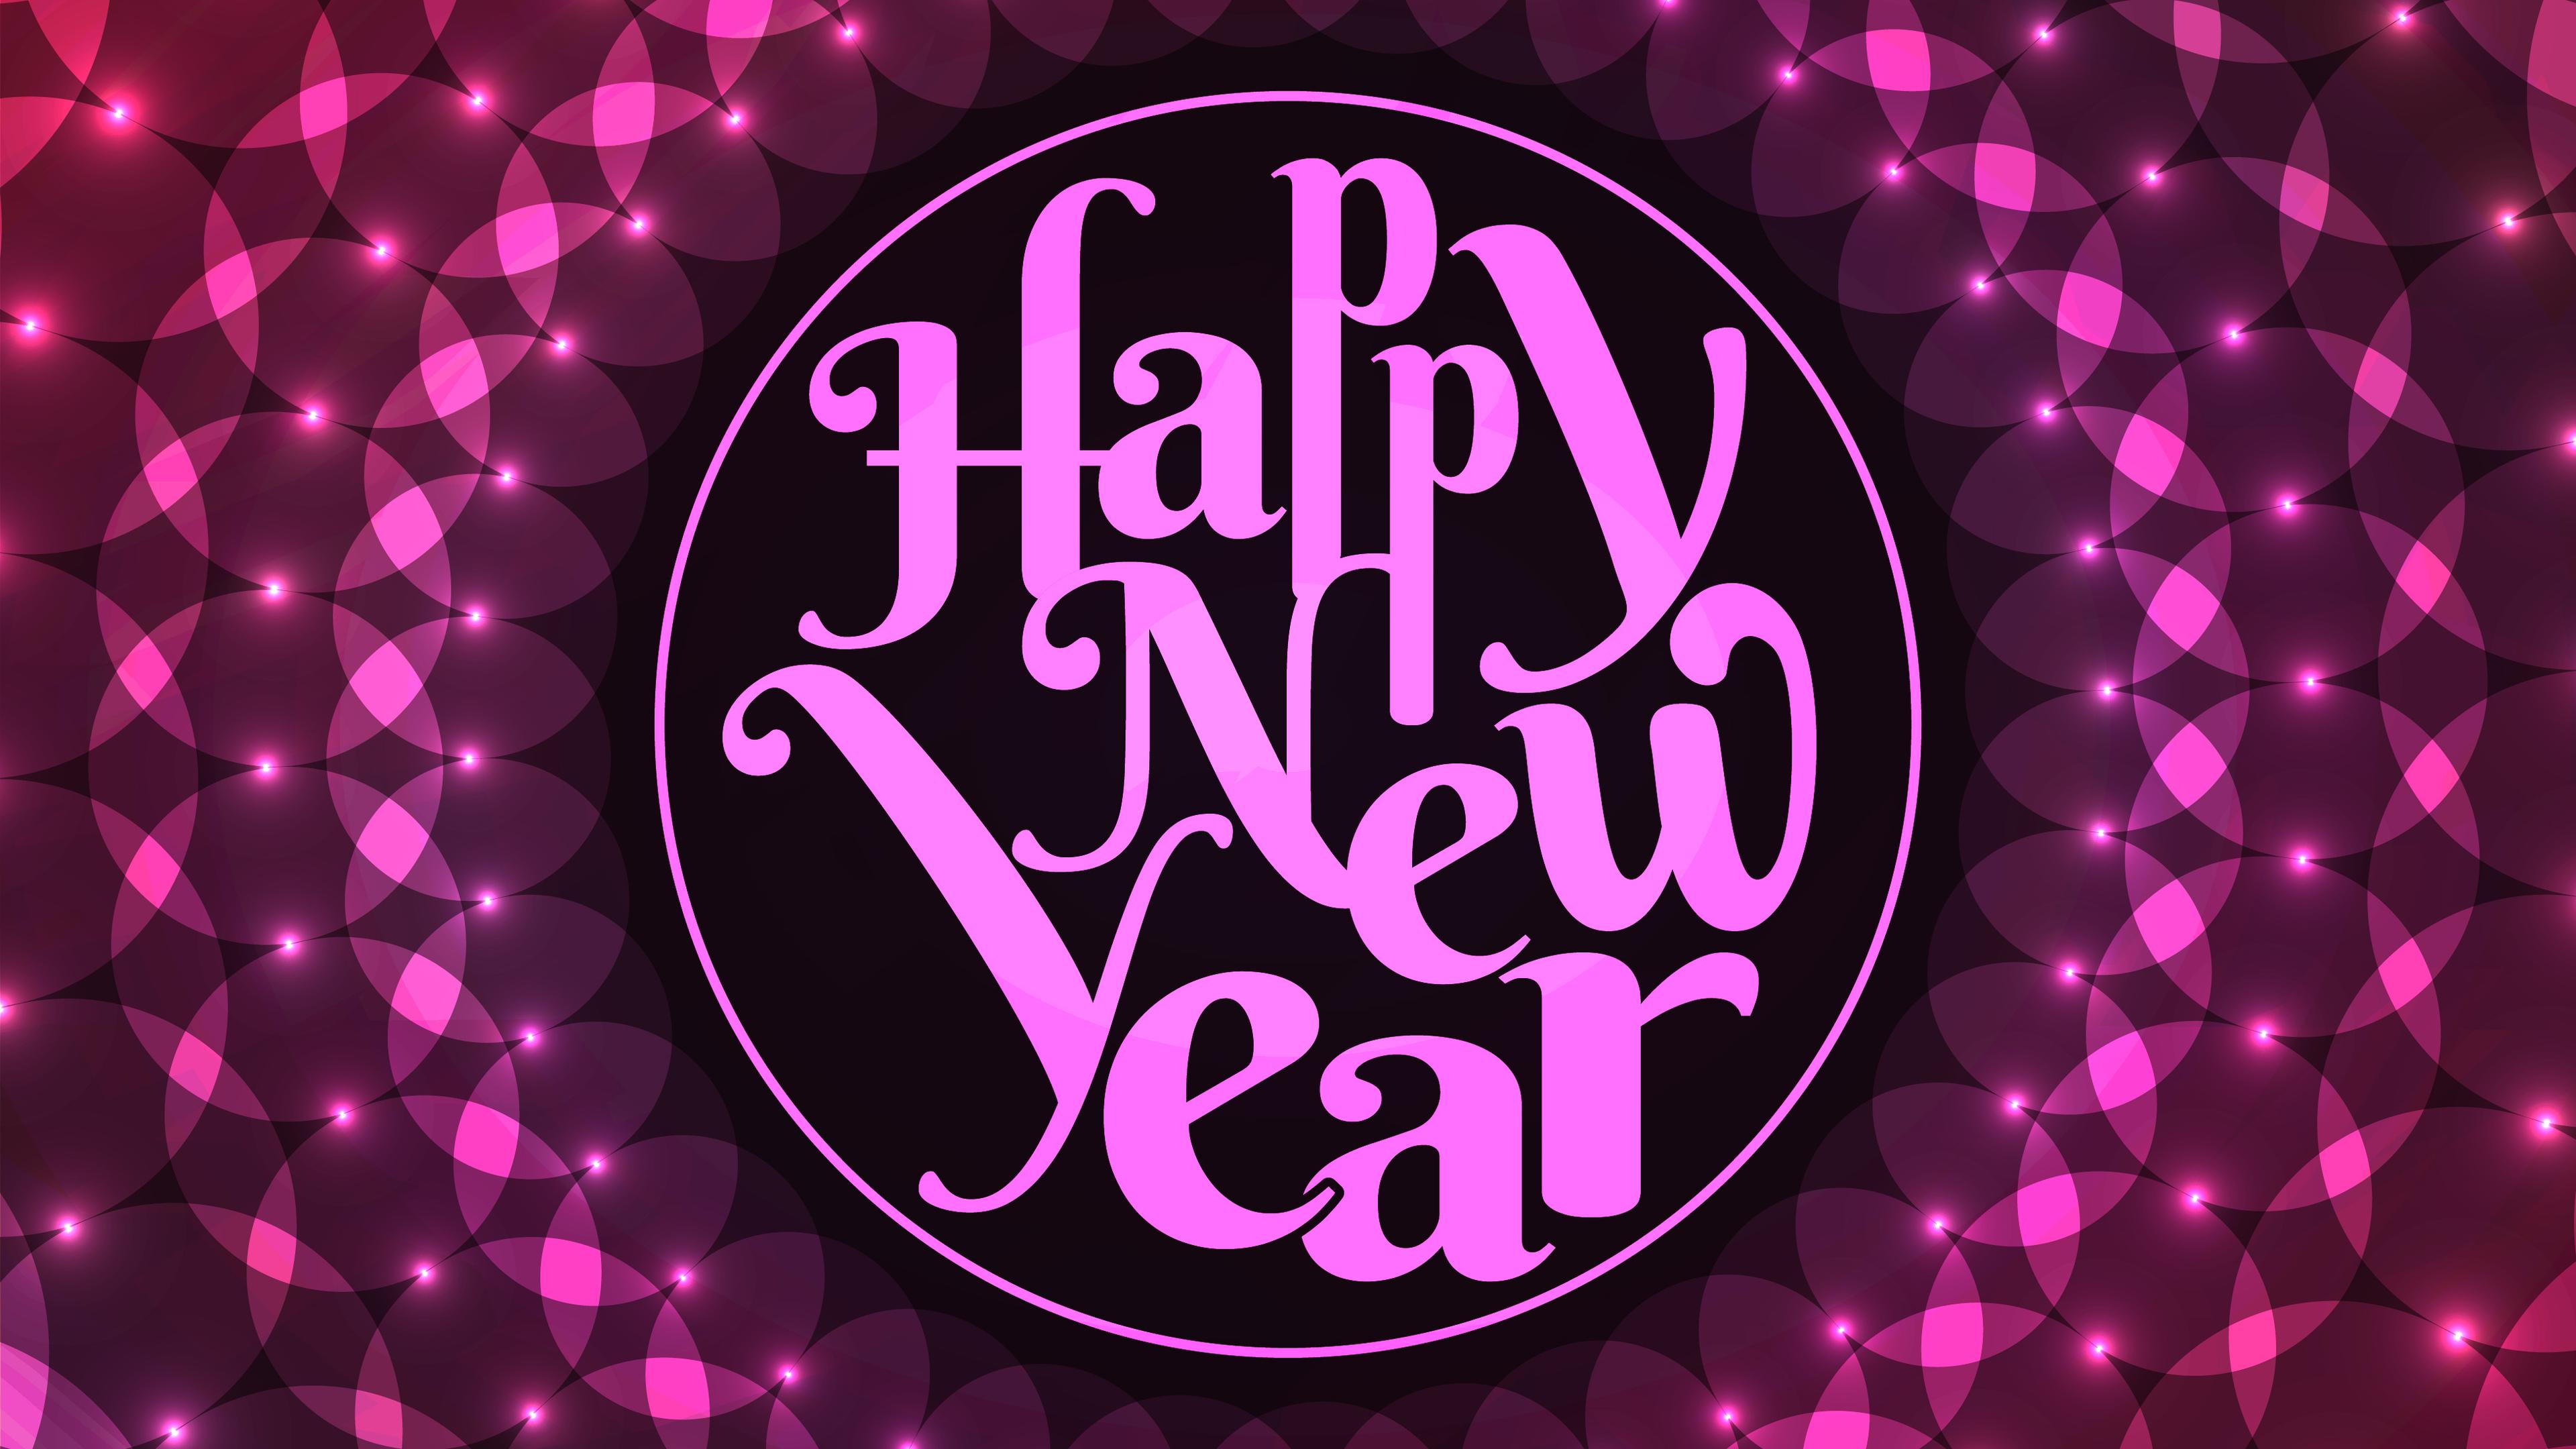 happy-new-year-4k-oj.jpg